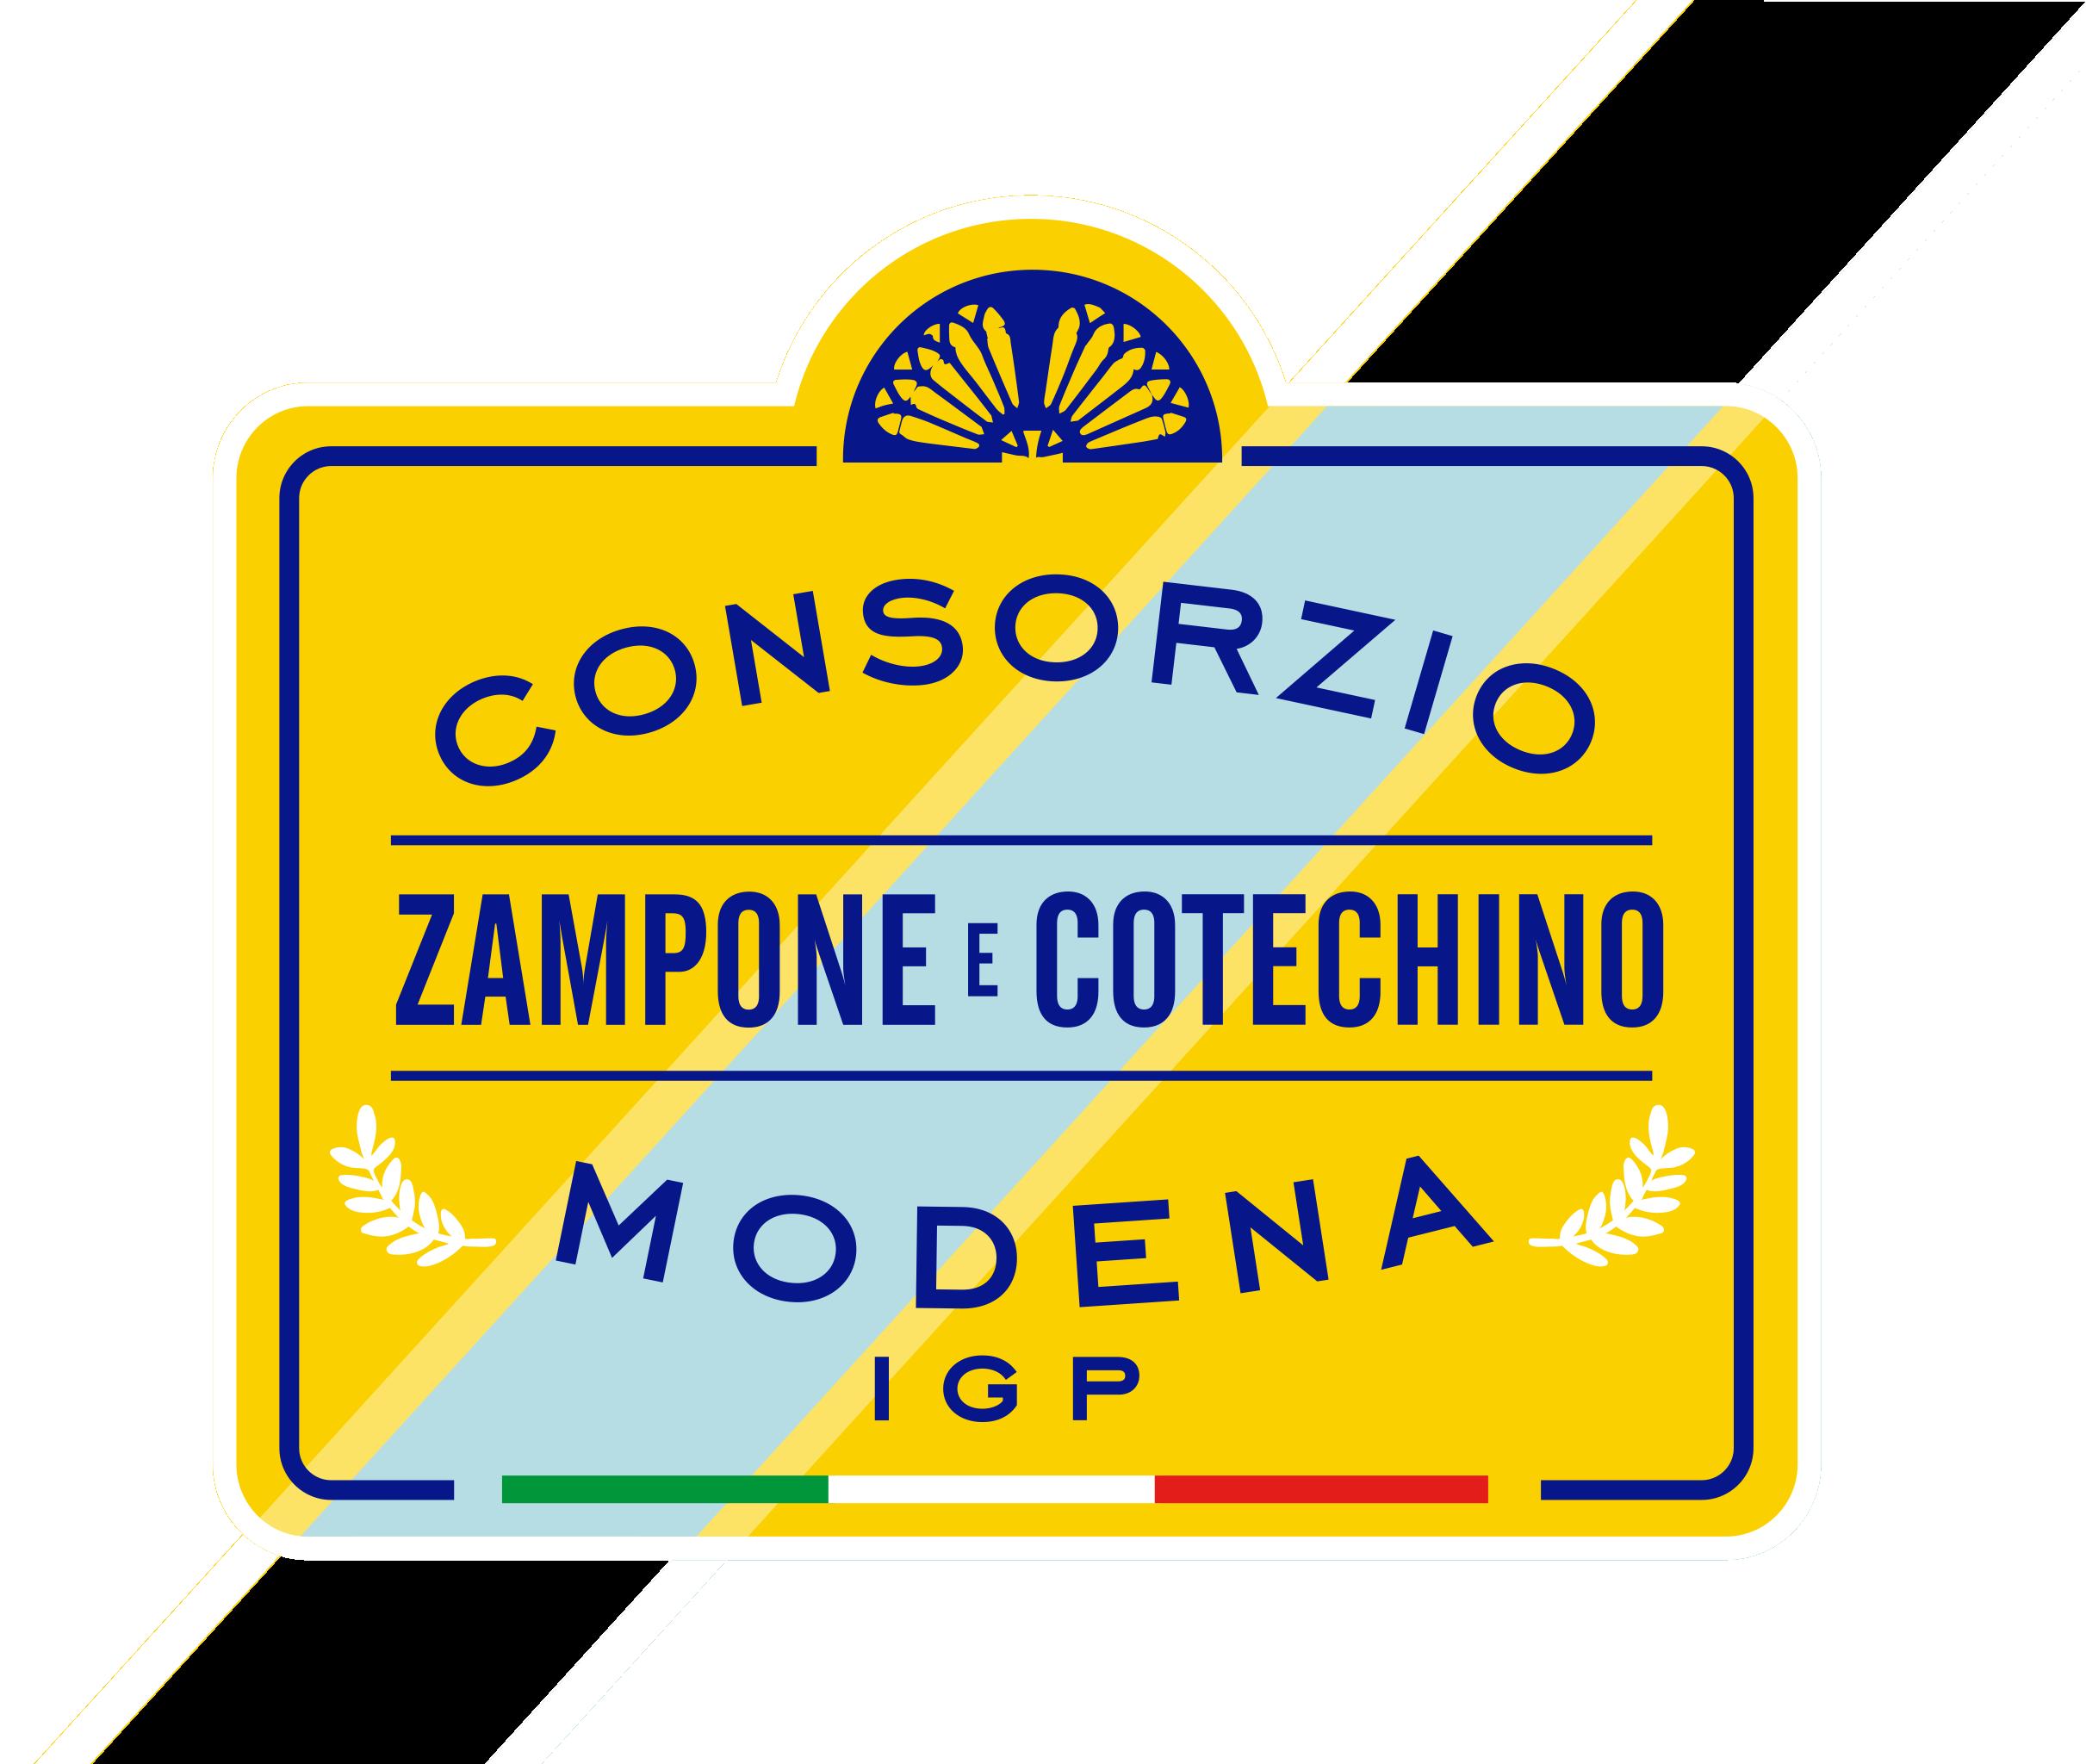 logo Zampone e Cotechino Modena IGP